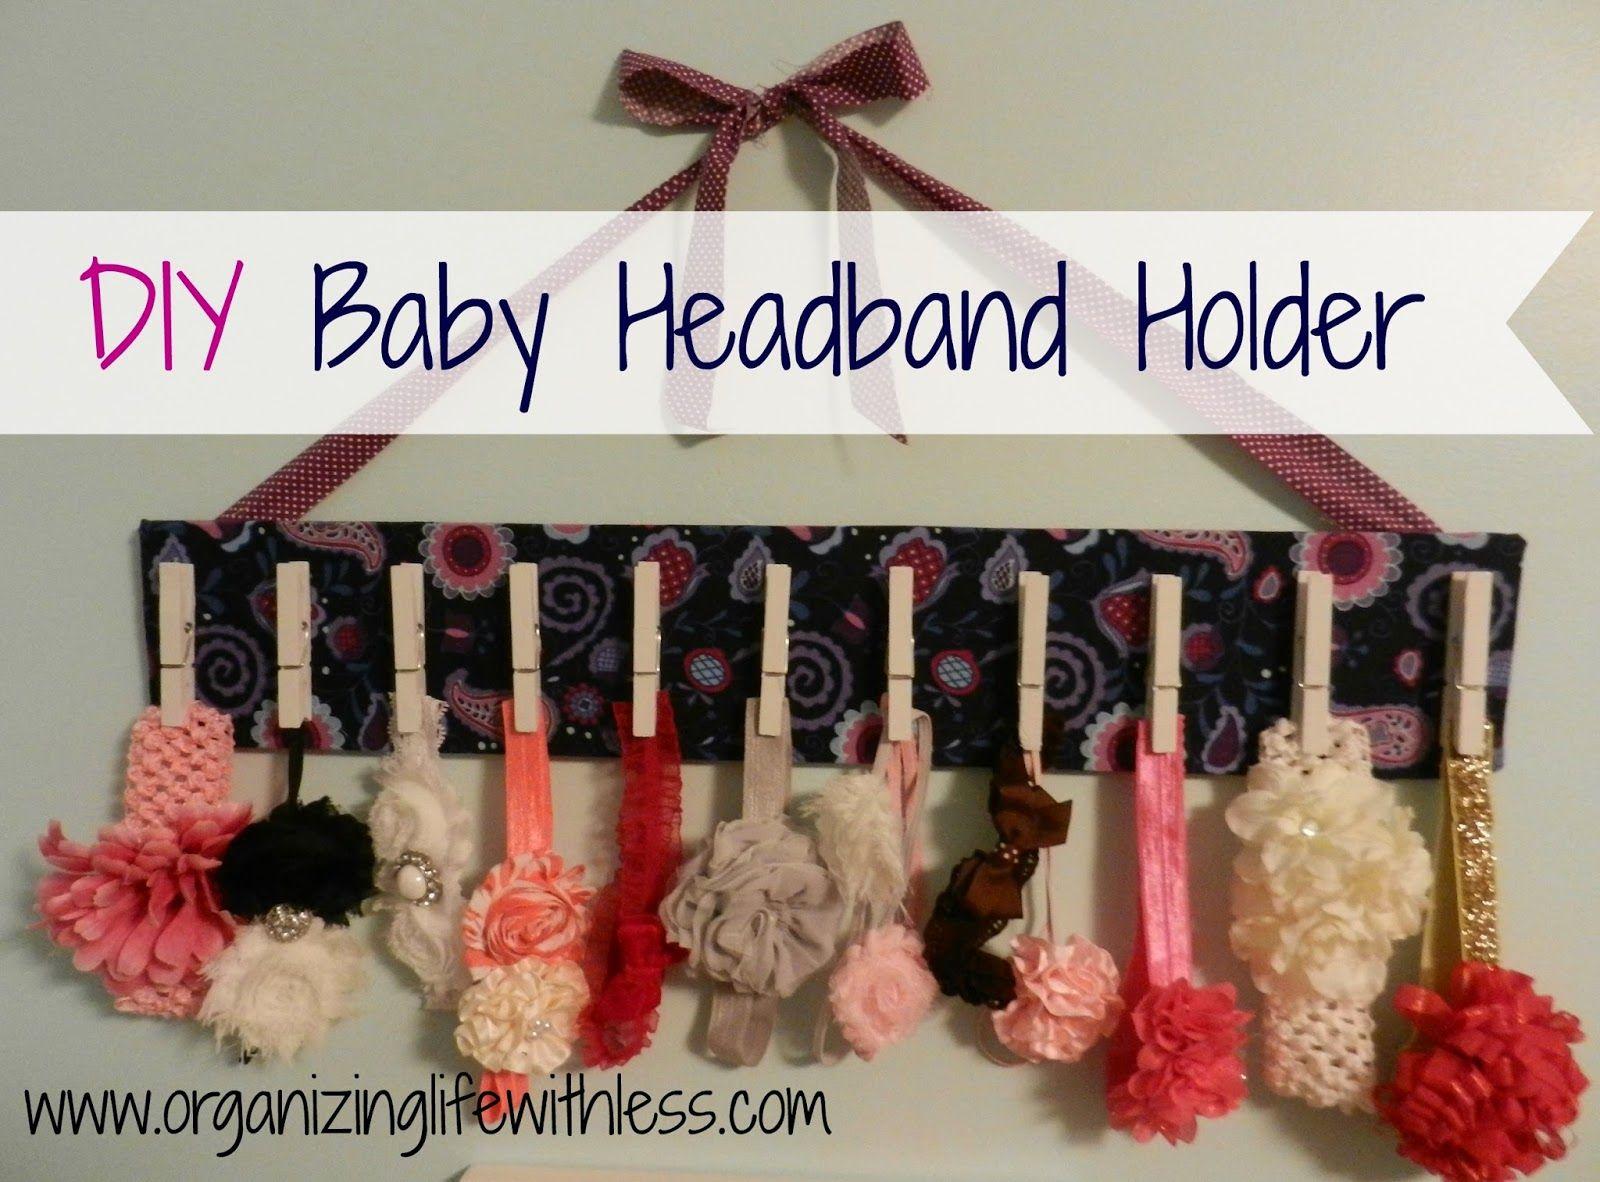 Baby headbands storage shoe organizer google search - Baby shoe organizer ideas ...